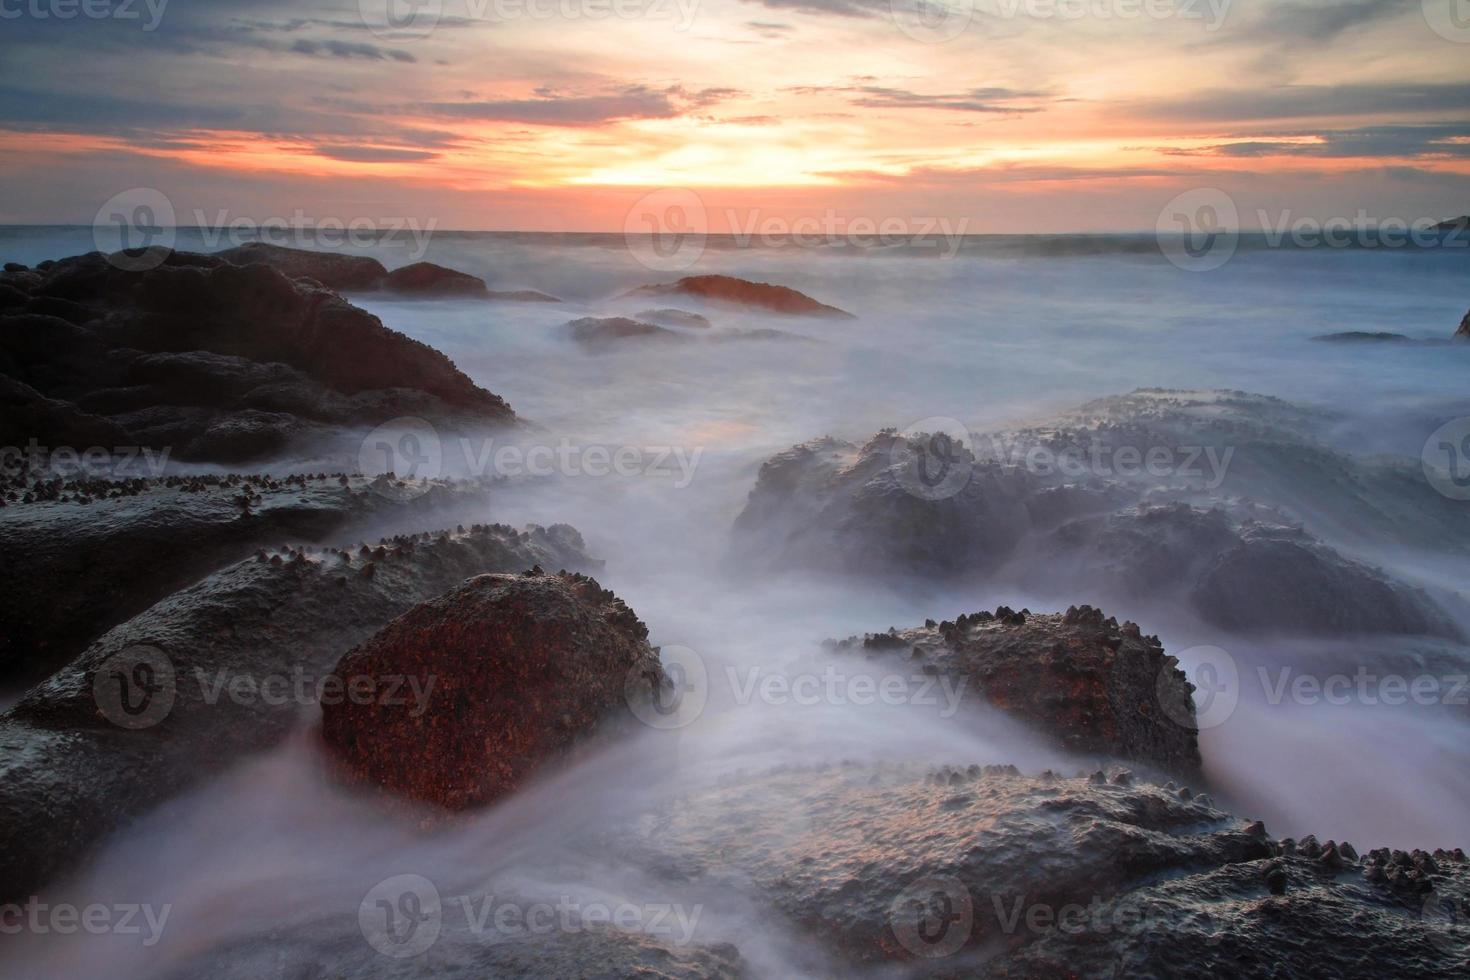 Motion Sea waves hit rock on beach, Phuket photo